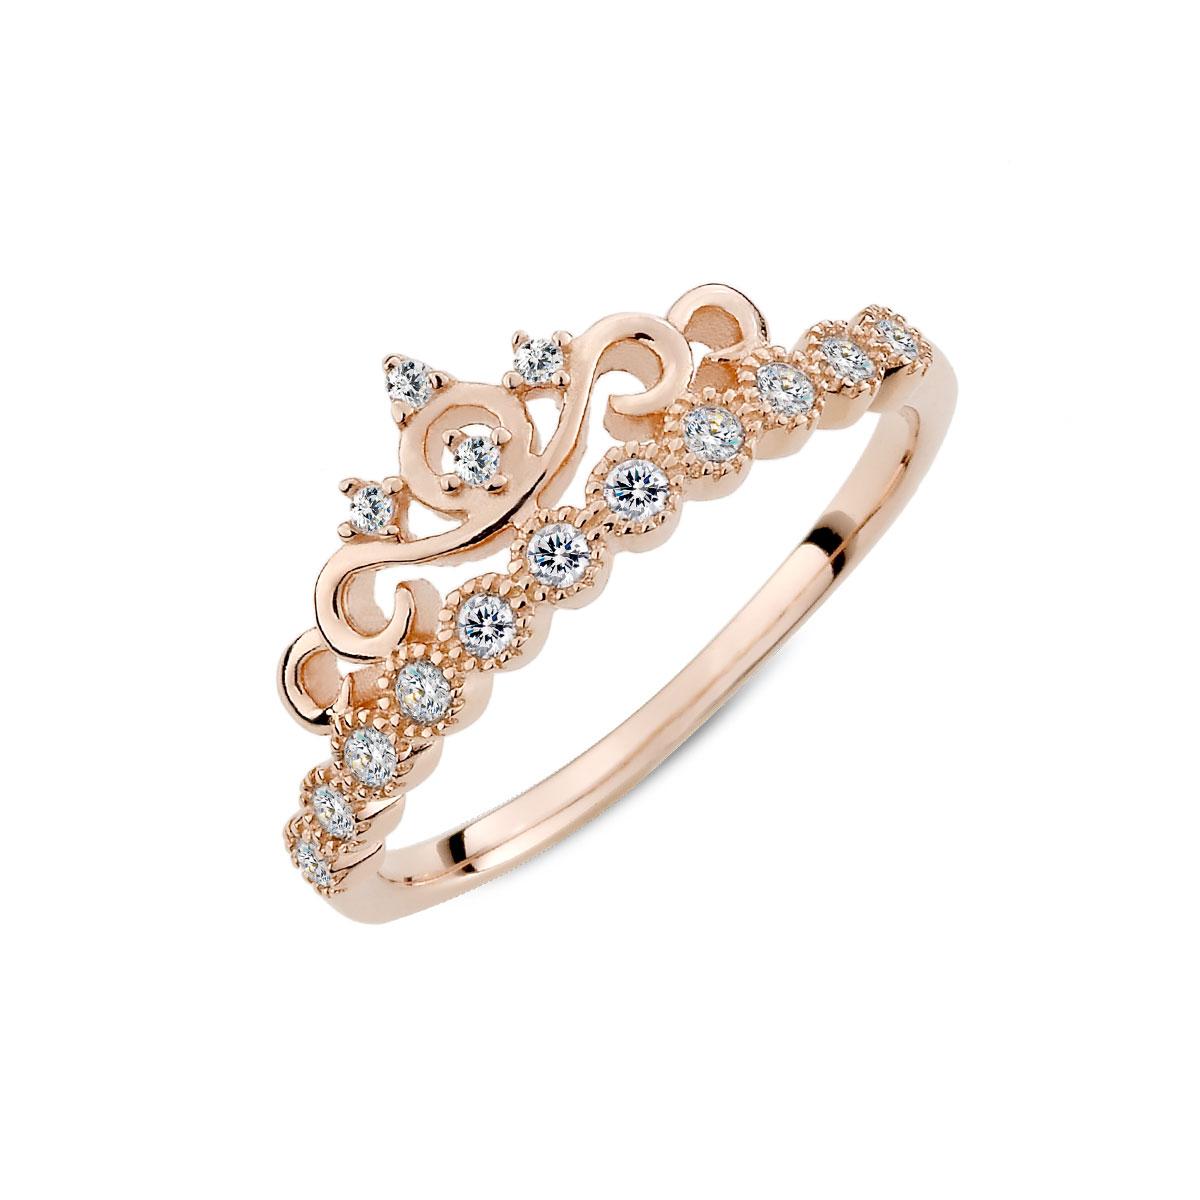 KSW228 仙杜瑞拉彩鑽戒指